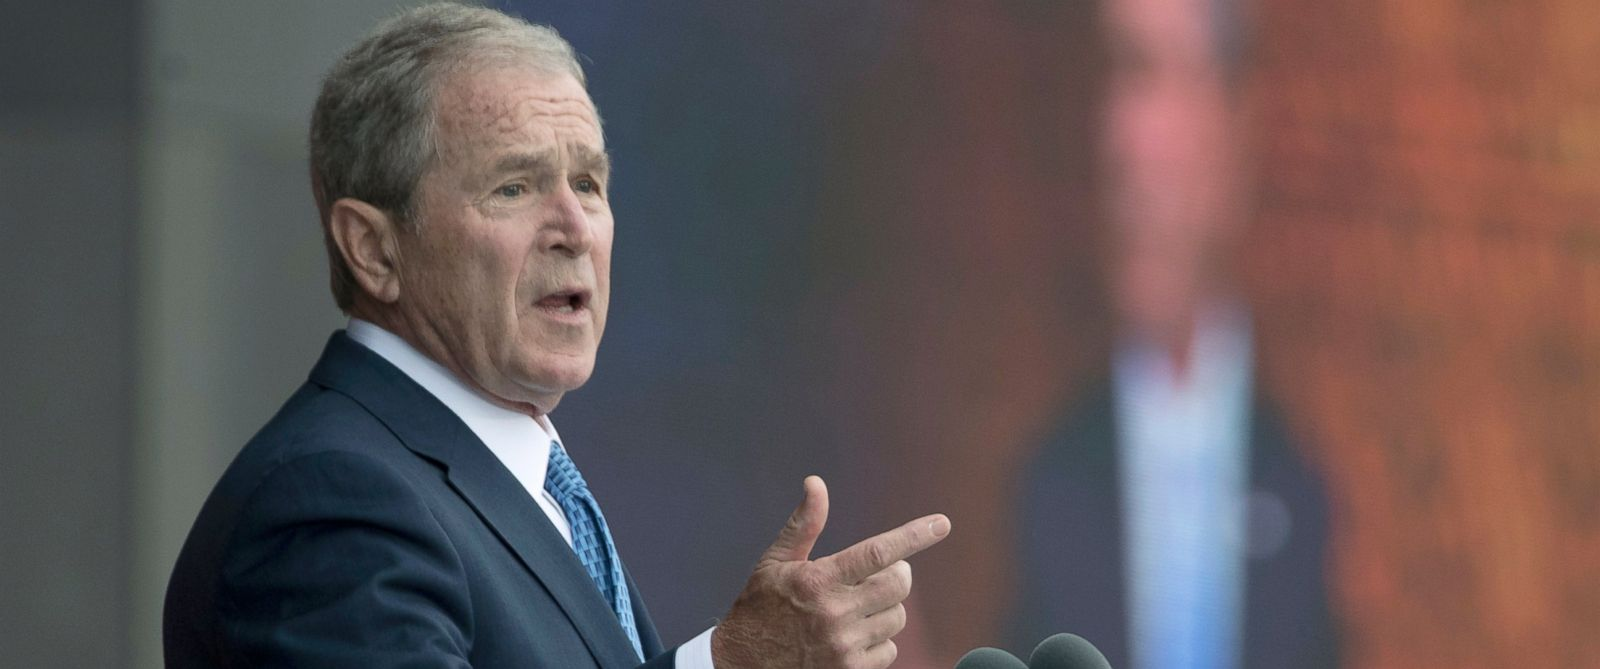 PHOTO: George W. Bush speaks in Washington, Sept. 24, 2016.